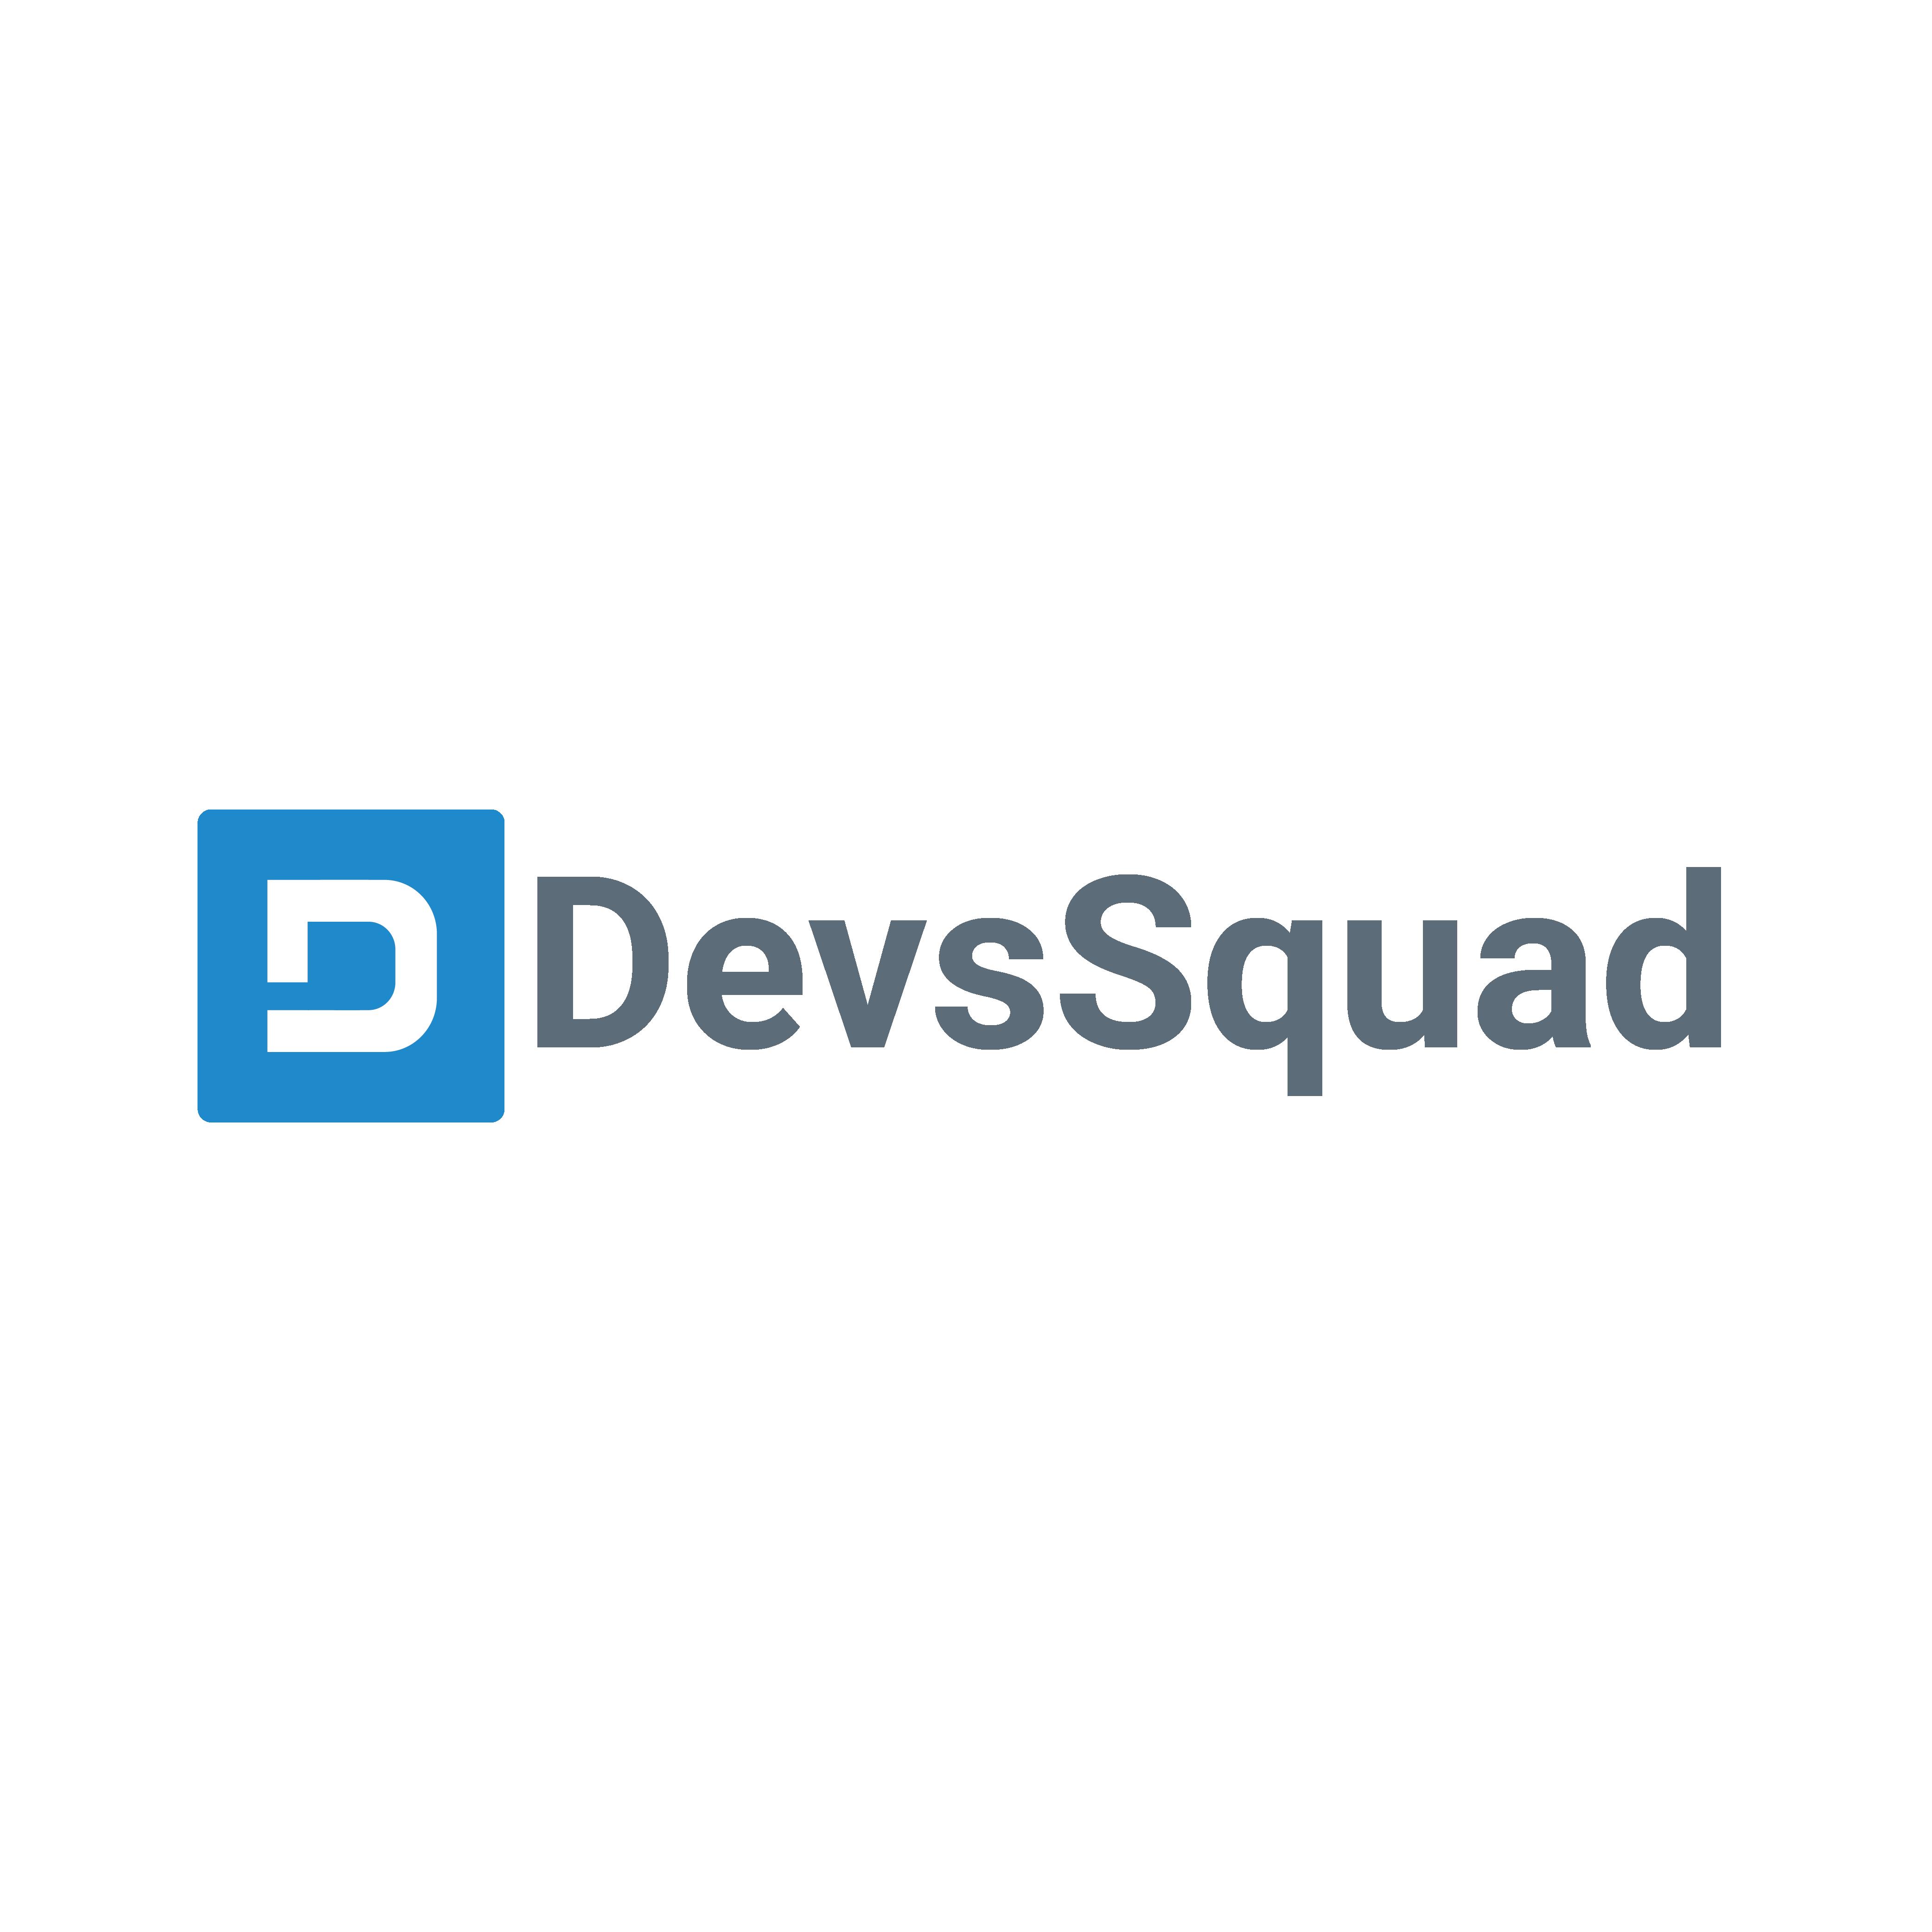 DevsSquad Logo Create website, Logos, Allianz logo